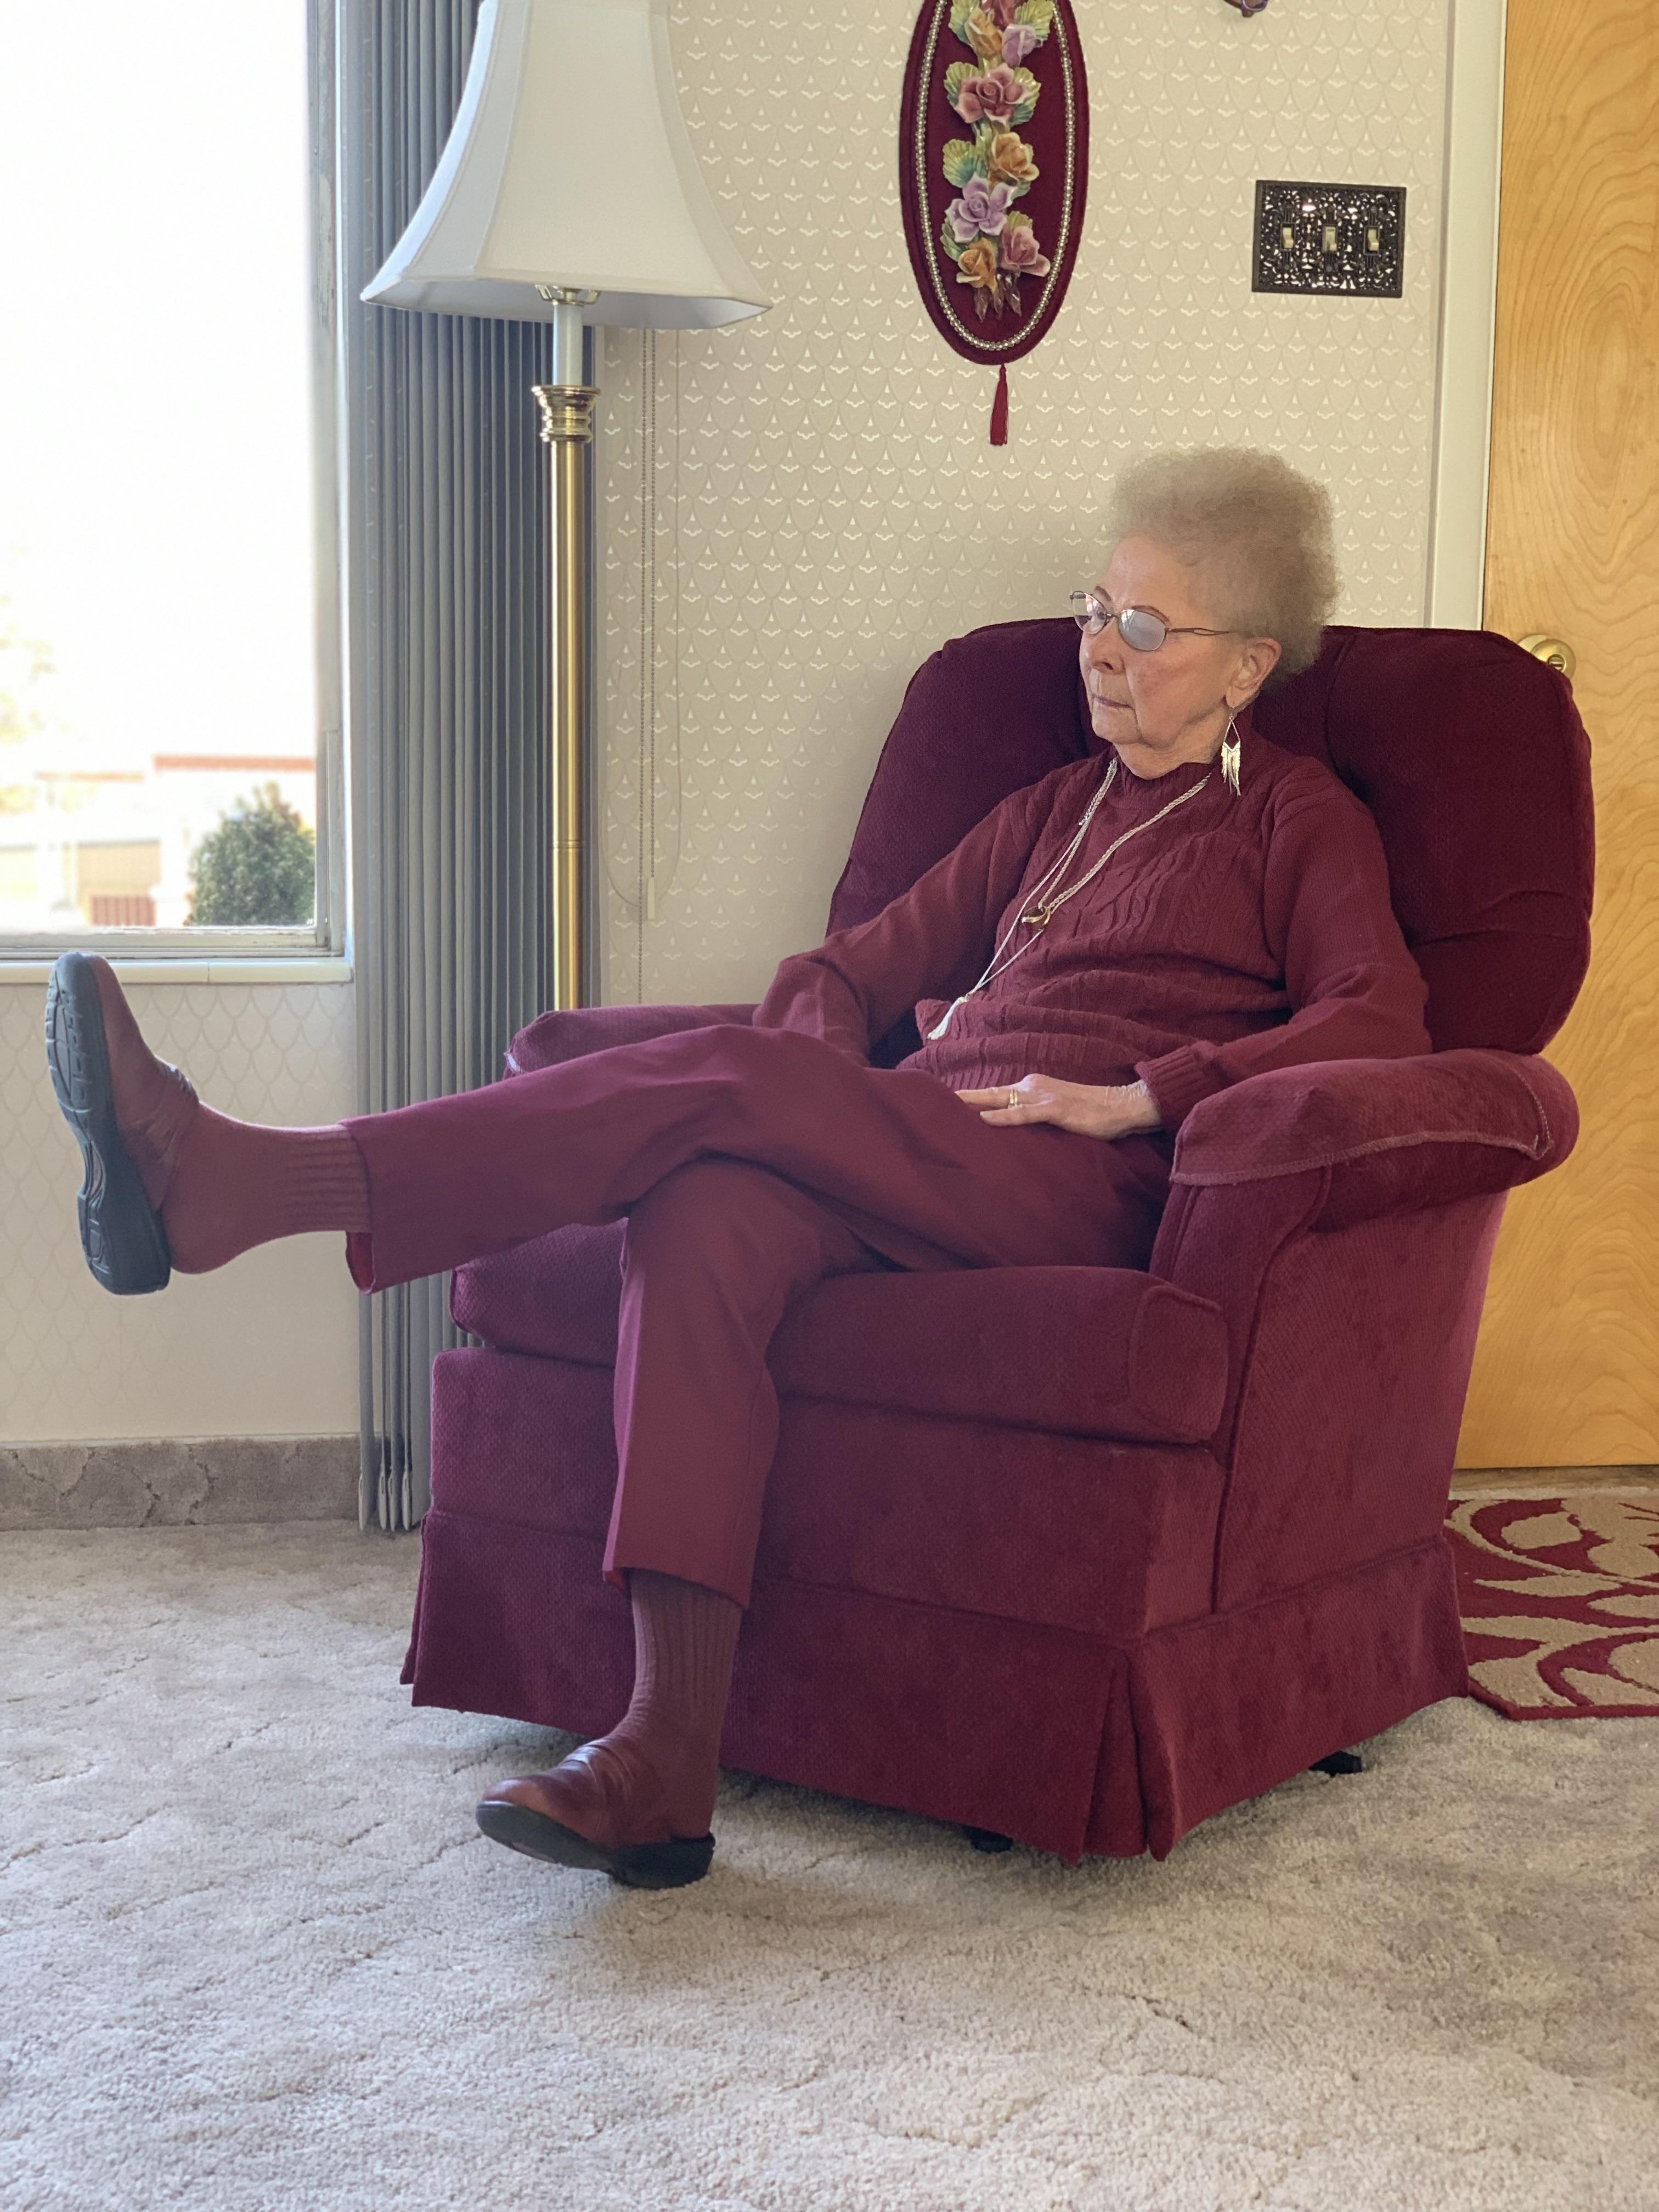 Sometimes we lose my grandma